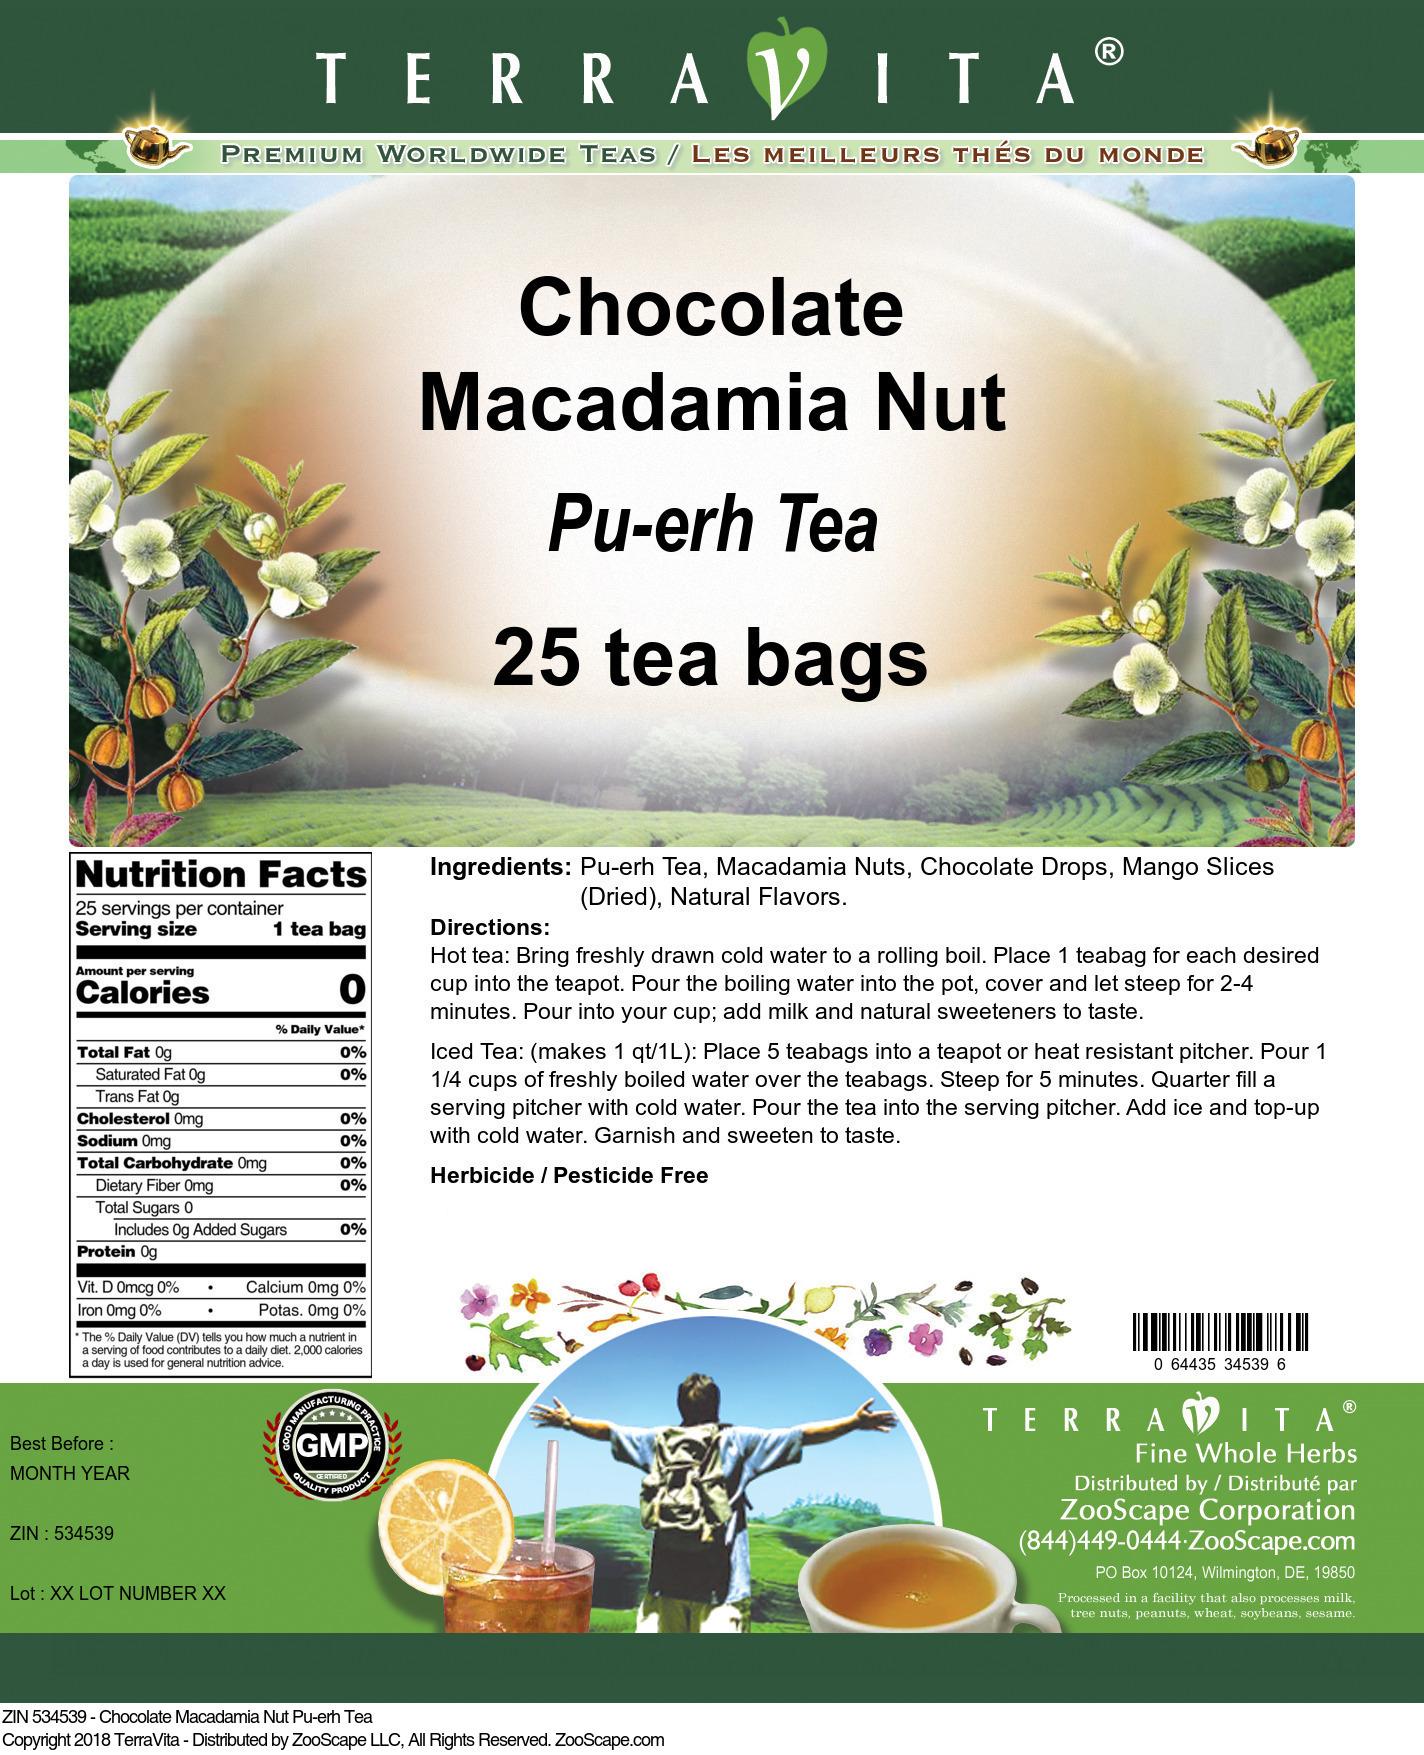 Chocolate Macadamia Nut Pu-erh Tea